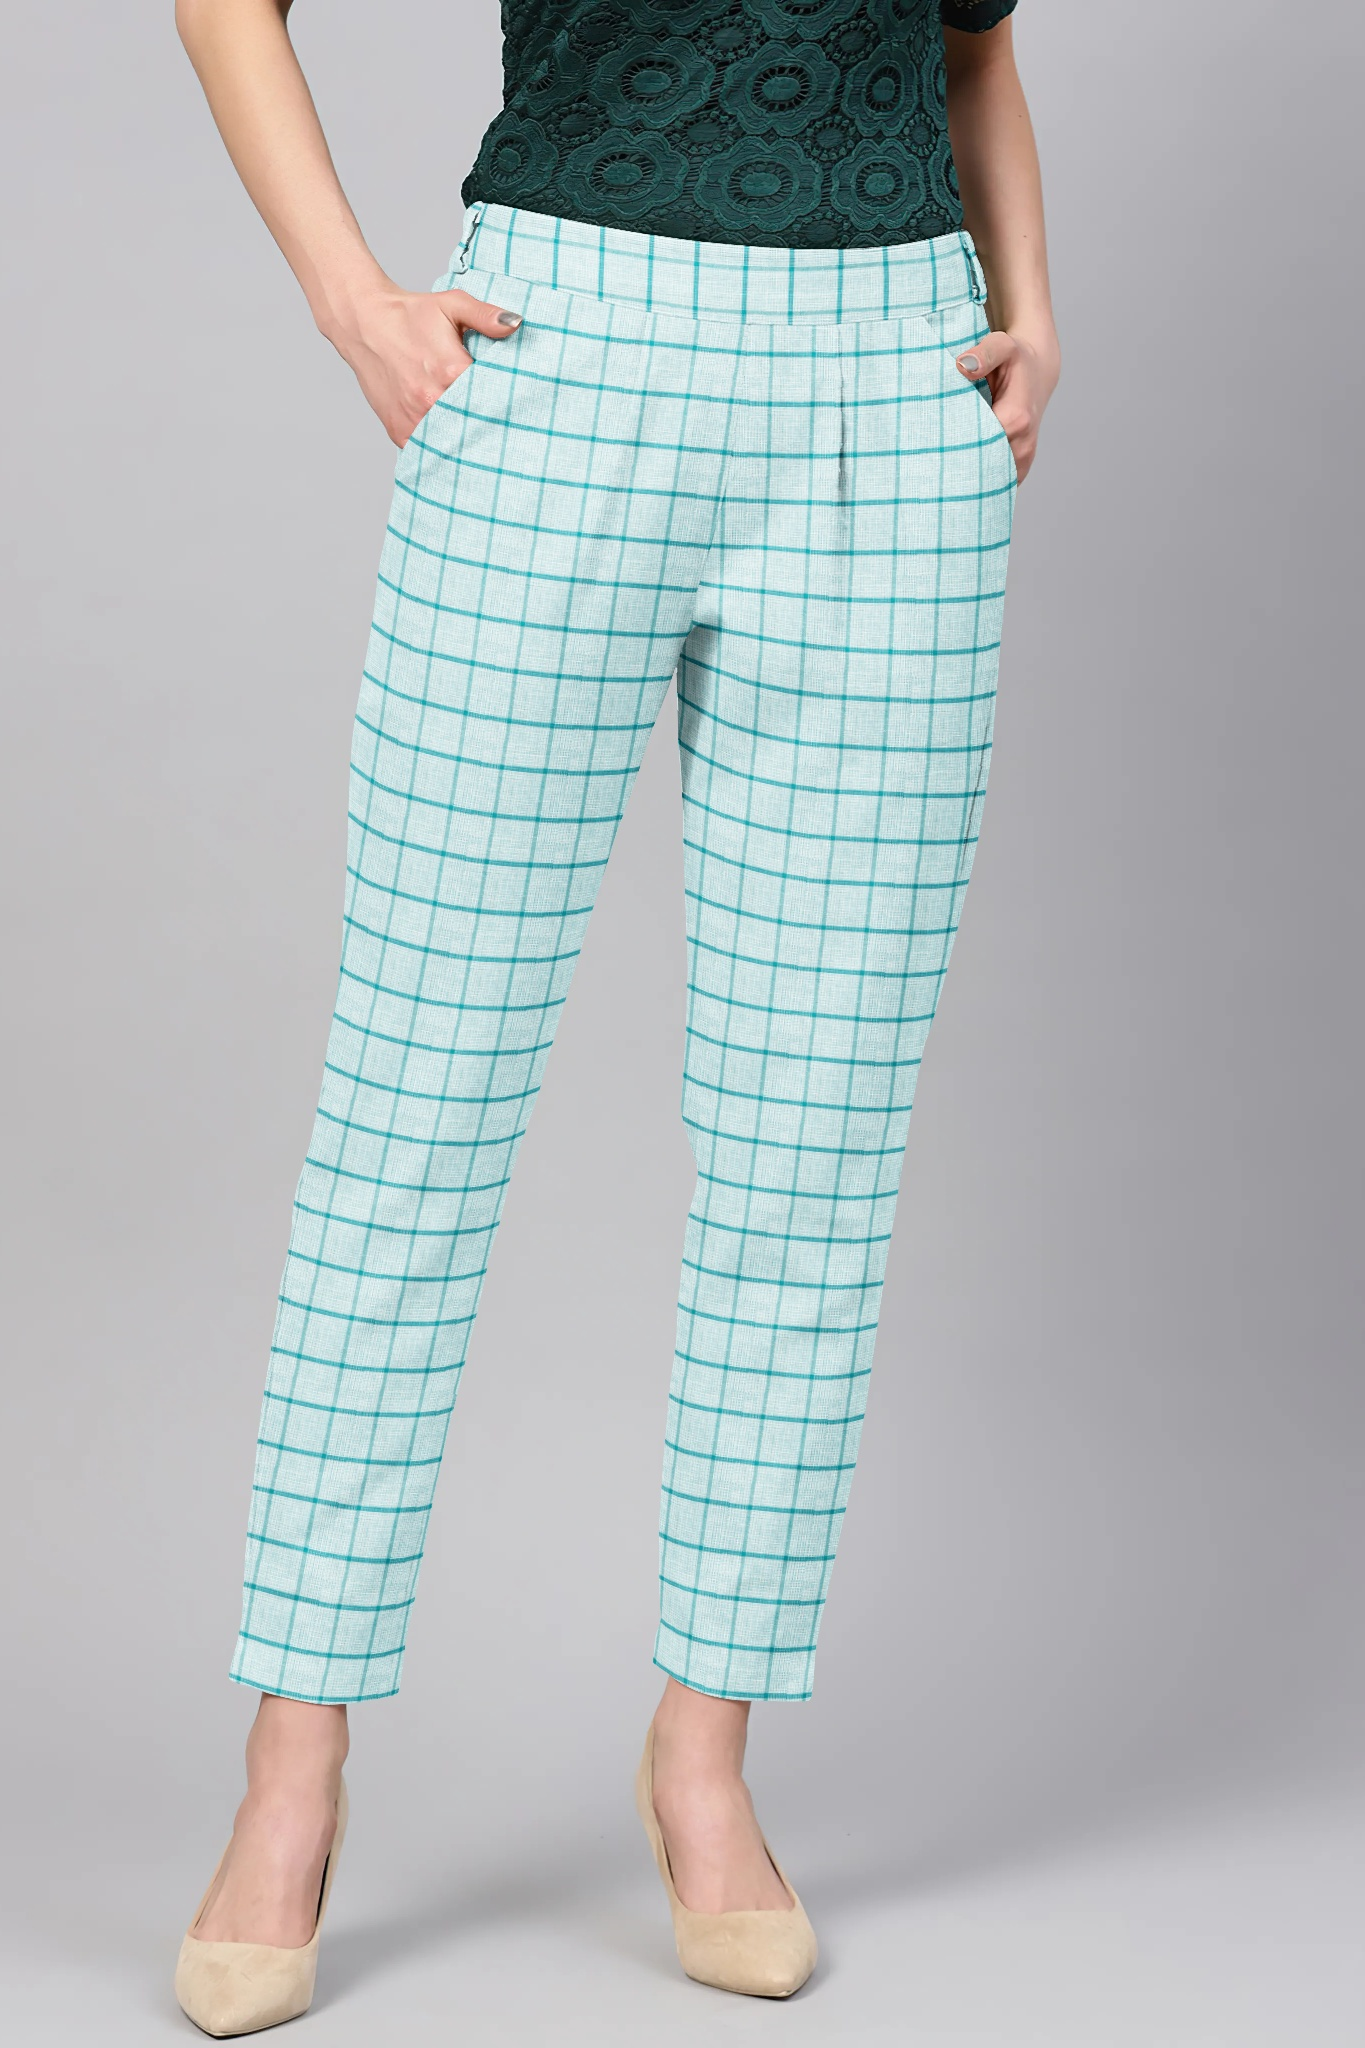 /home/customer/www/fabartcraft.com/public_html/uploadshttps://www.shopolics.com/uploads/images/medium/Sky-Blue-Black-Cotton-Check-Regular-Fit-Solid-Trouser-36094.jpg